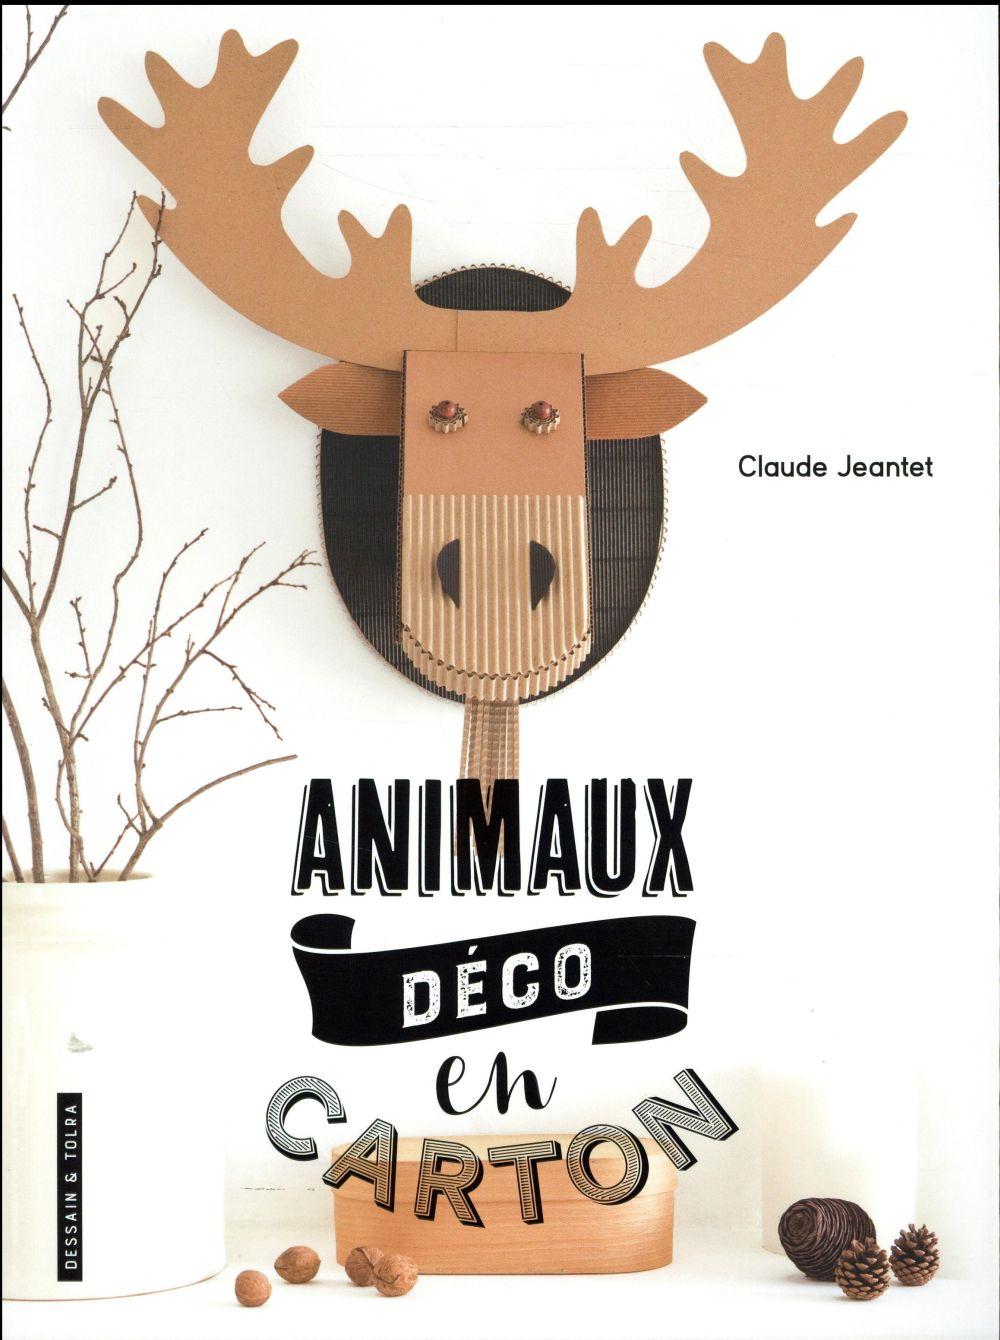 "ANIMAUX ""DECO"" EN CARTON"